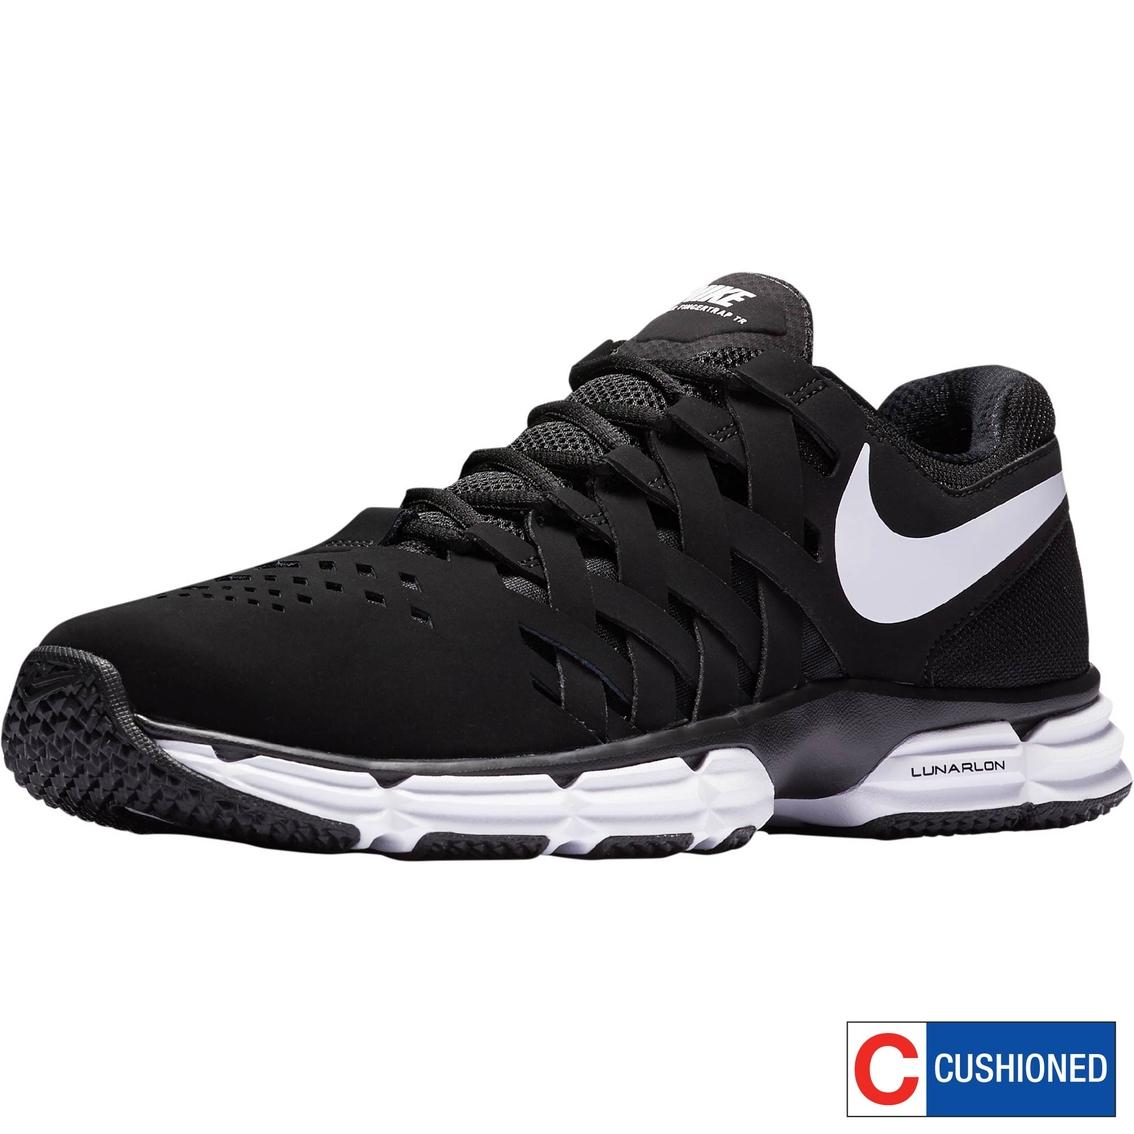 14542c03171f ... uk nike lunar mens fingertrap tr training shoes 2e902 de207